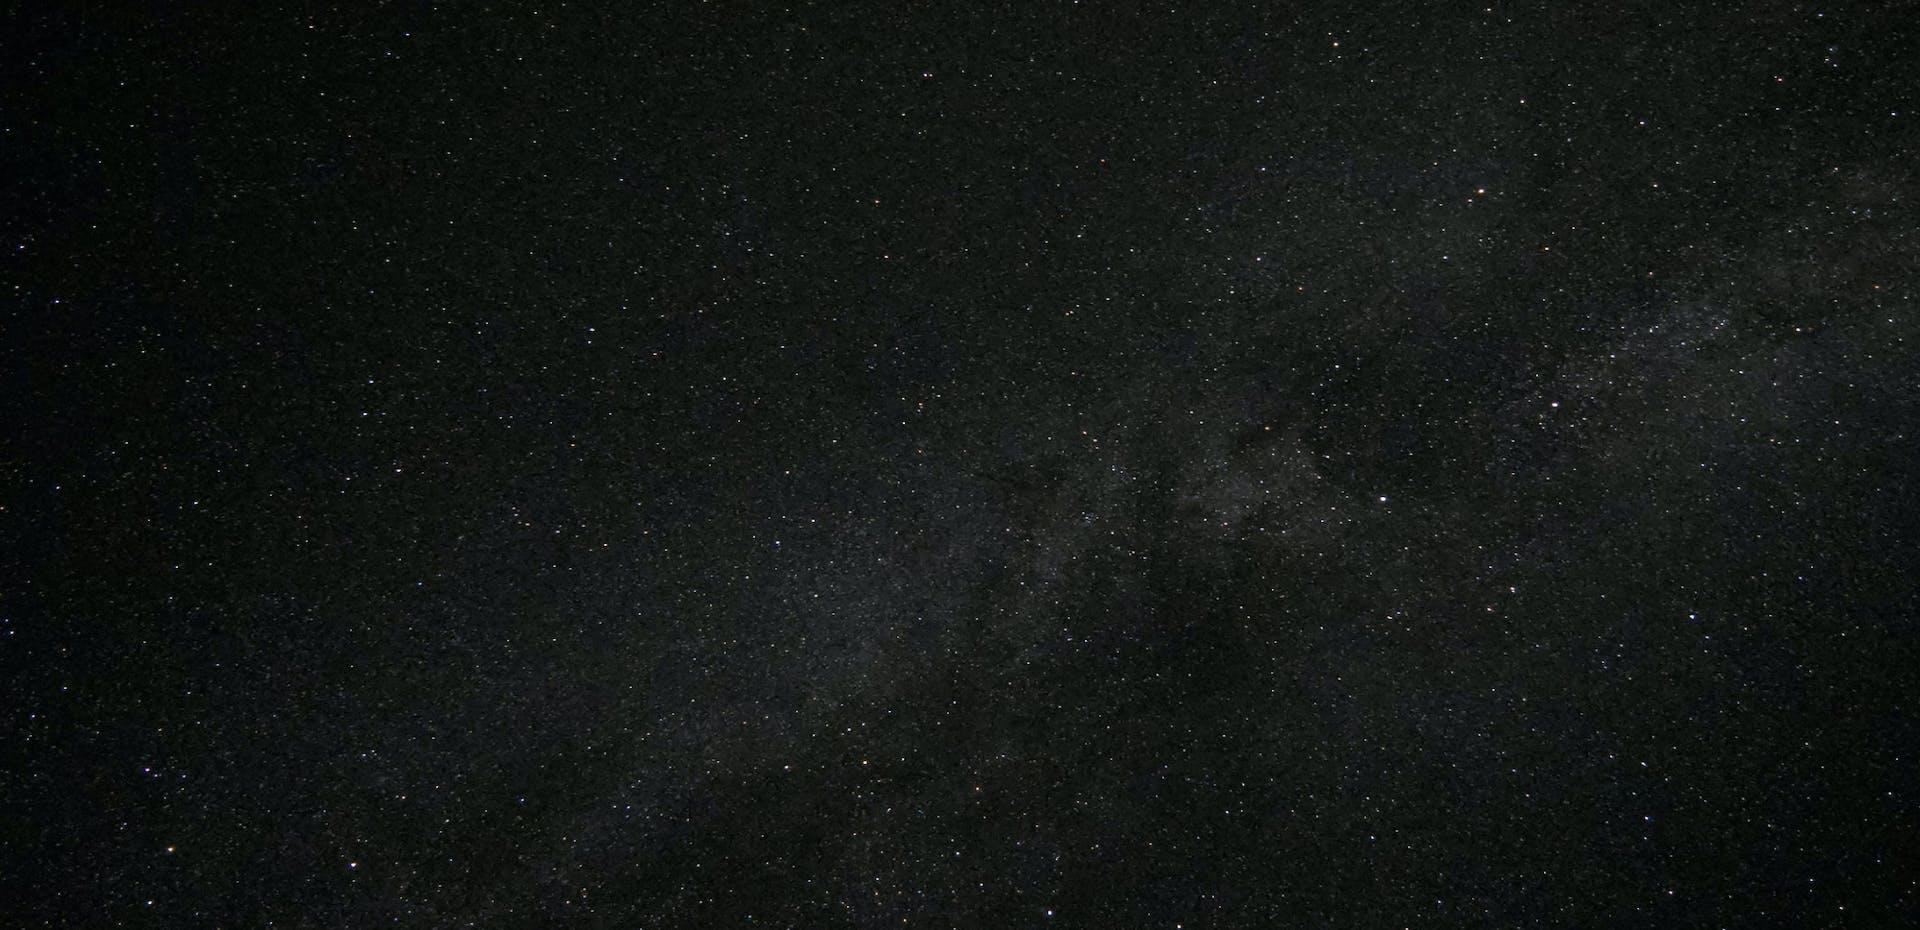 Mørk materie i universet